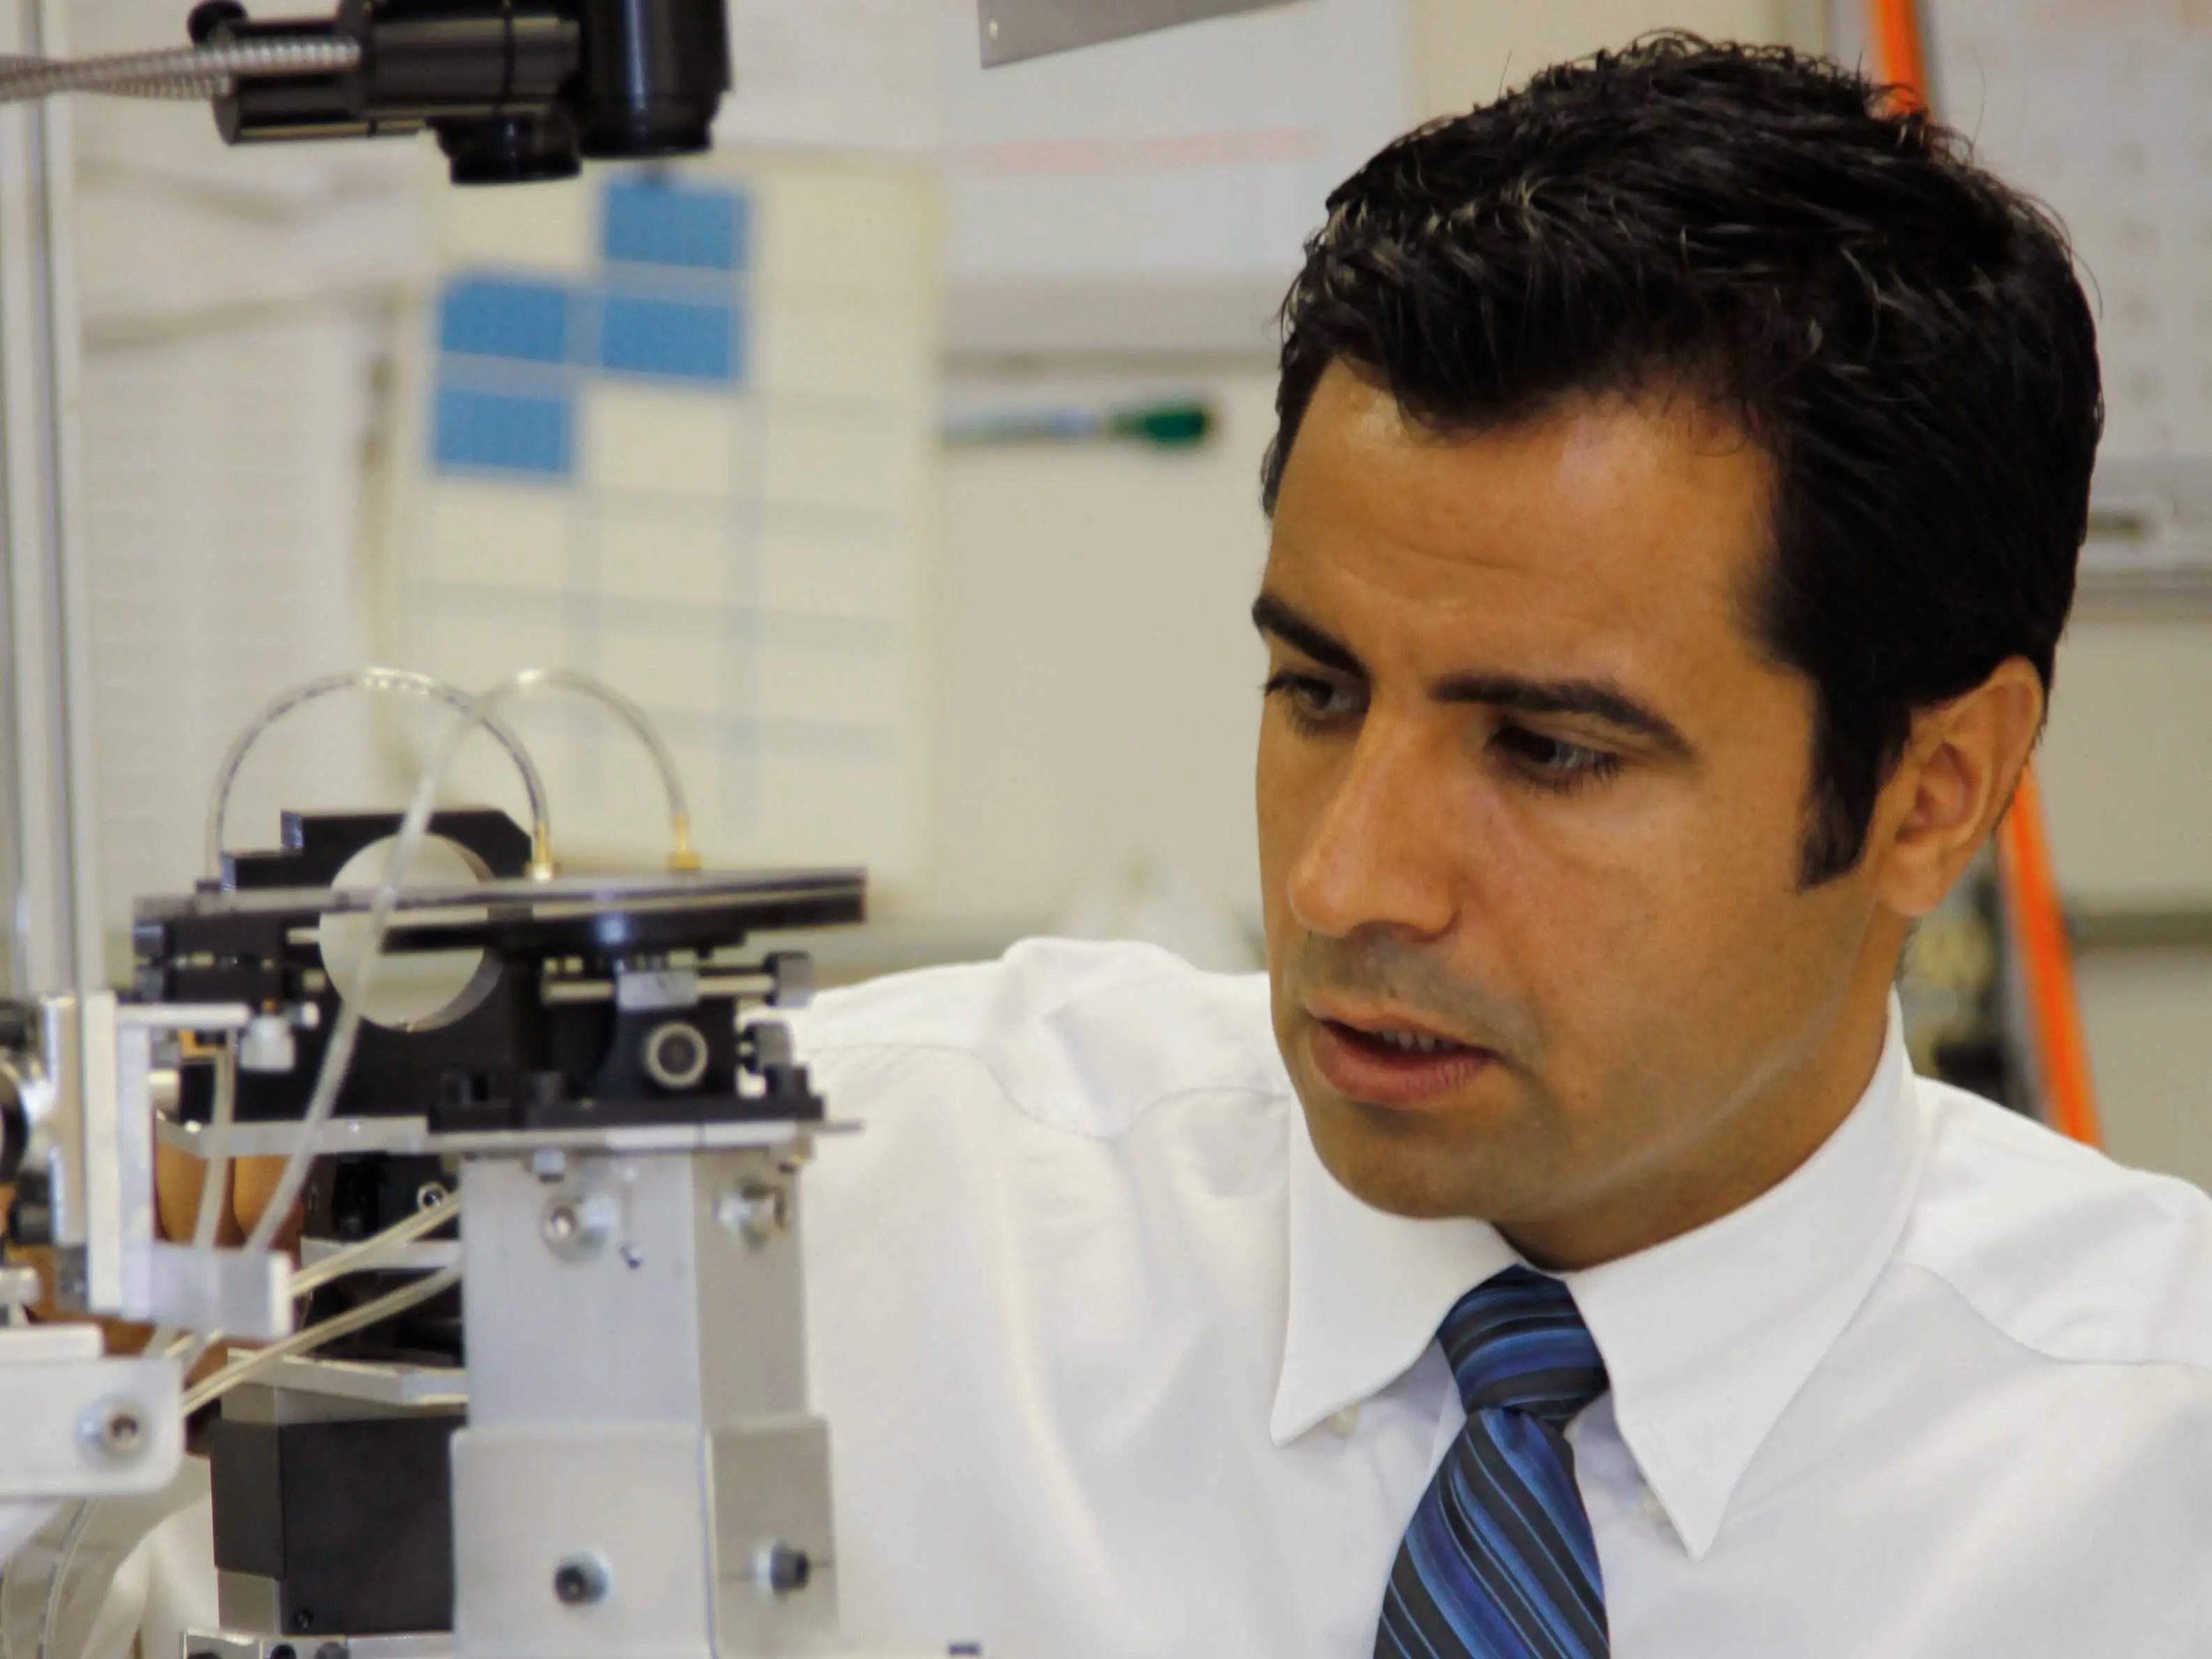 KENTUCKY: Dr. Mehdi Yazdanpanah, CEO, Founder of NaugaNeedles